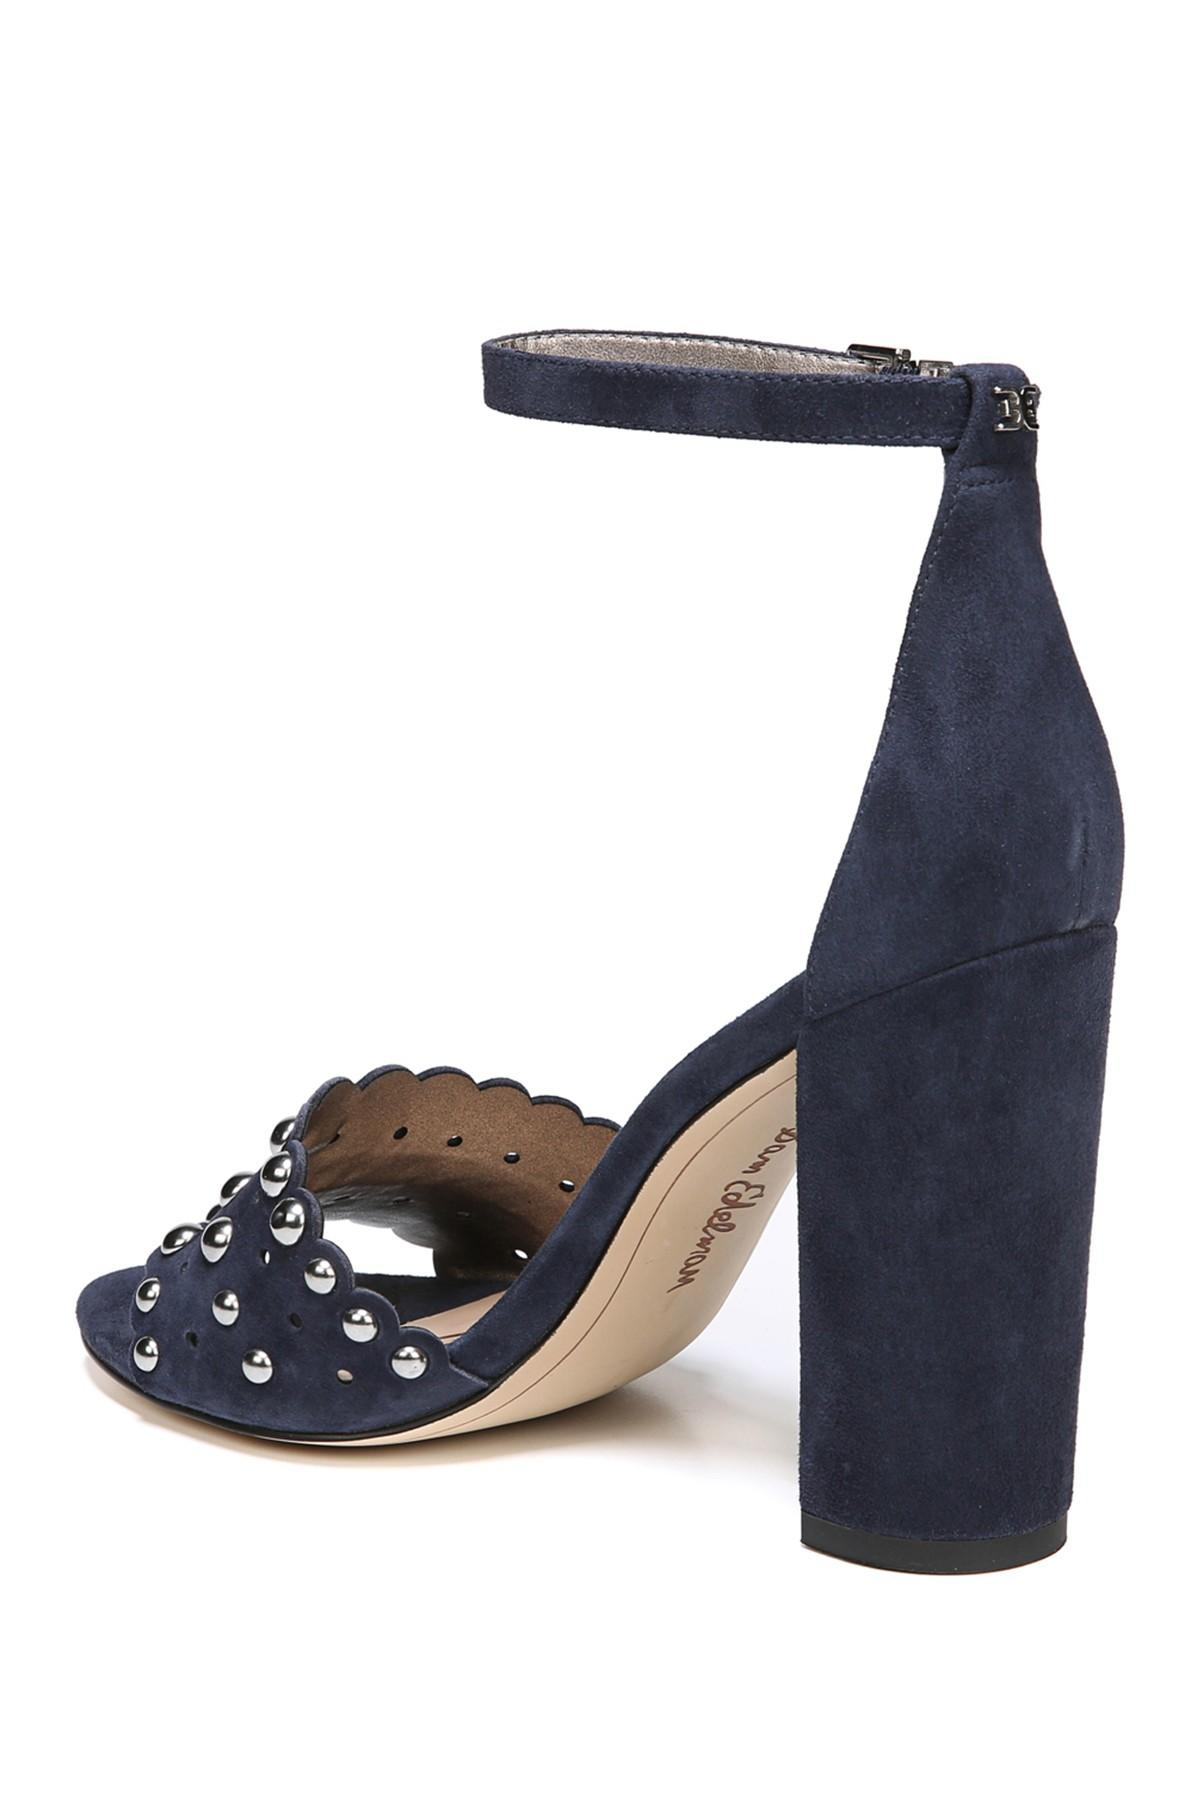 5695dd2d6a6b Sam Edelman - Blue Yaria Studded Block Heel Sandal - Lyst. View fullscreen